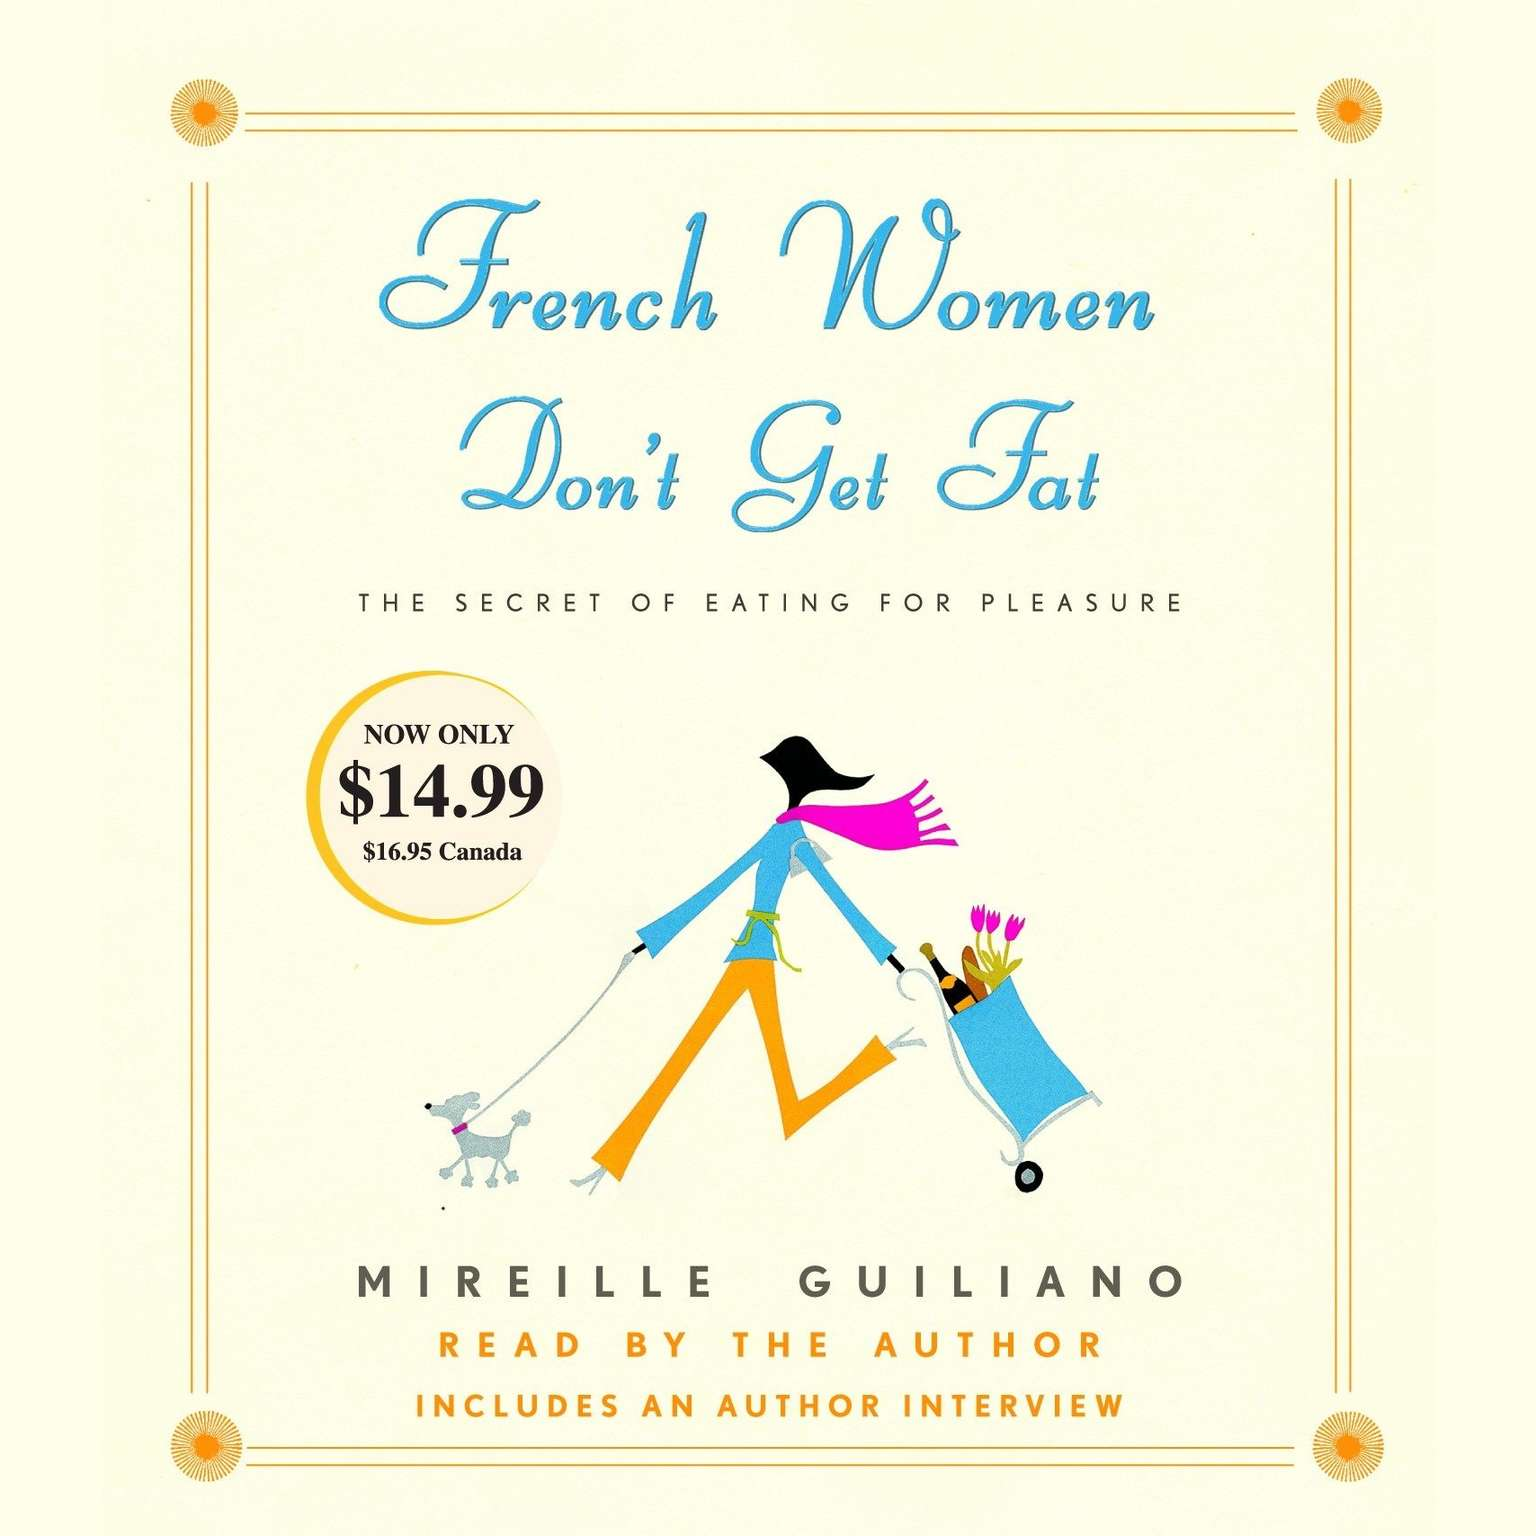 french women don 39 t get fat audiobook abridged listen instantly. Black Bedroom Furniture Sets. Home Design Ideas